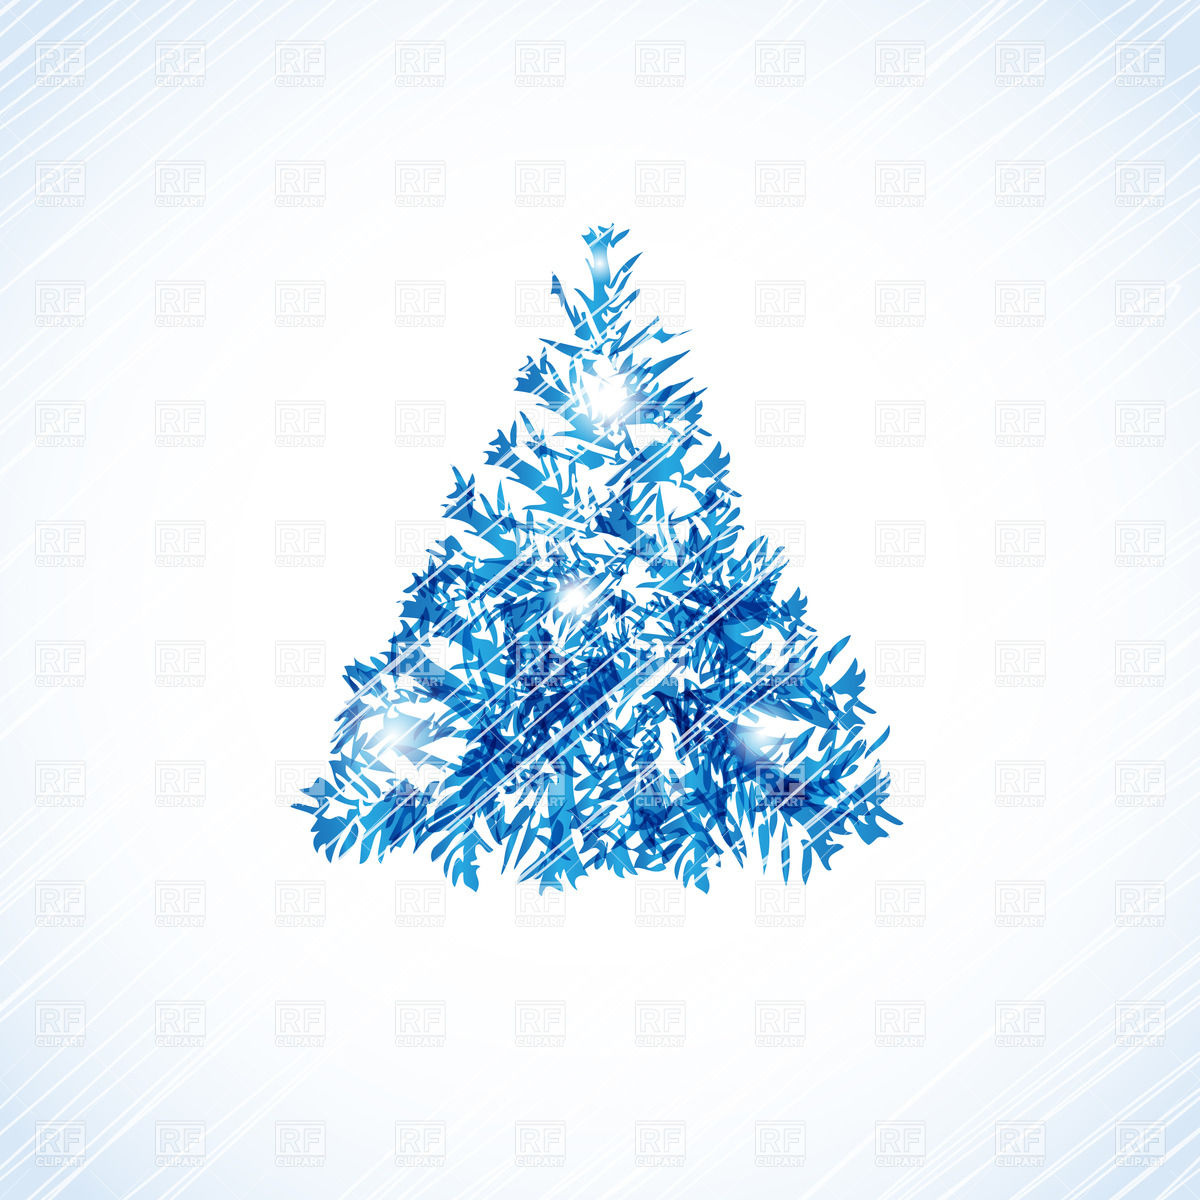 Abstract Christmas Tree Made Of